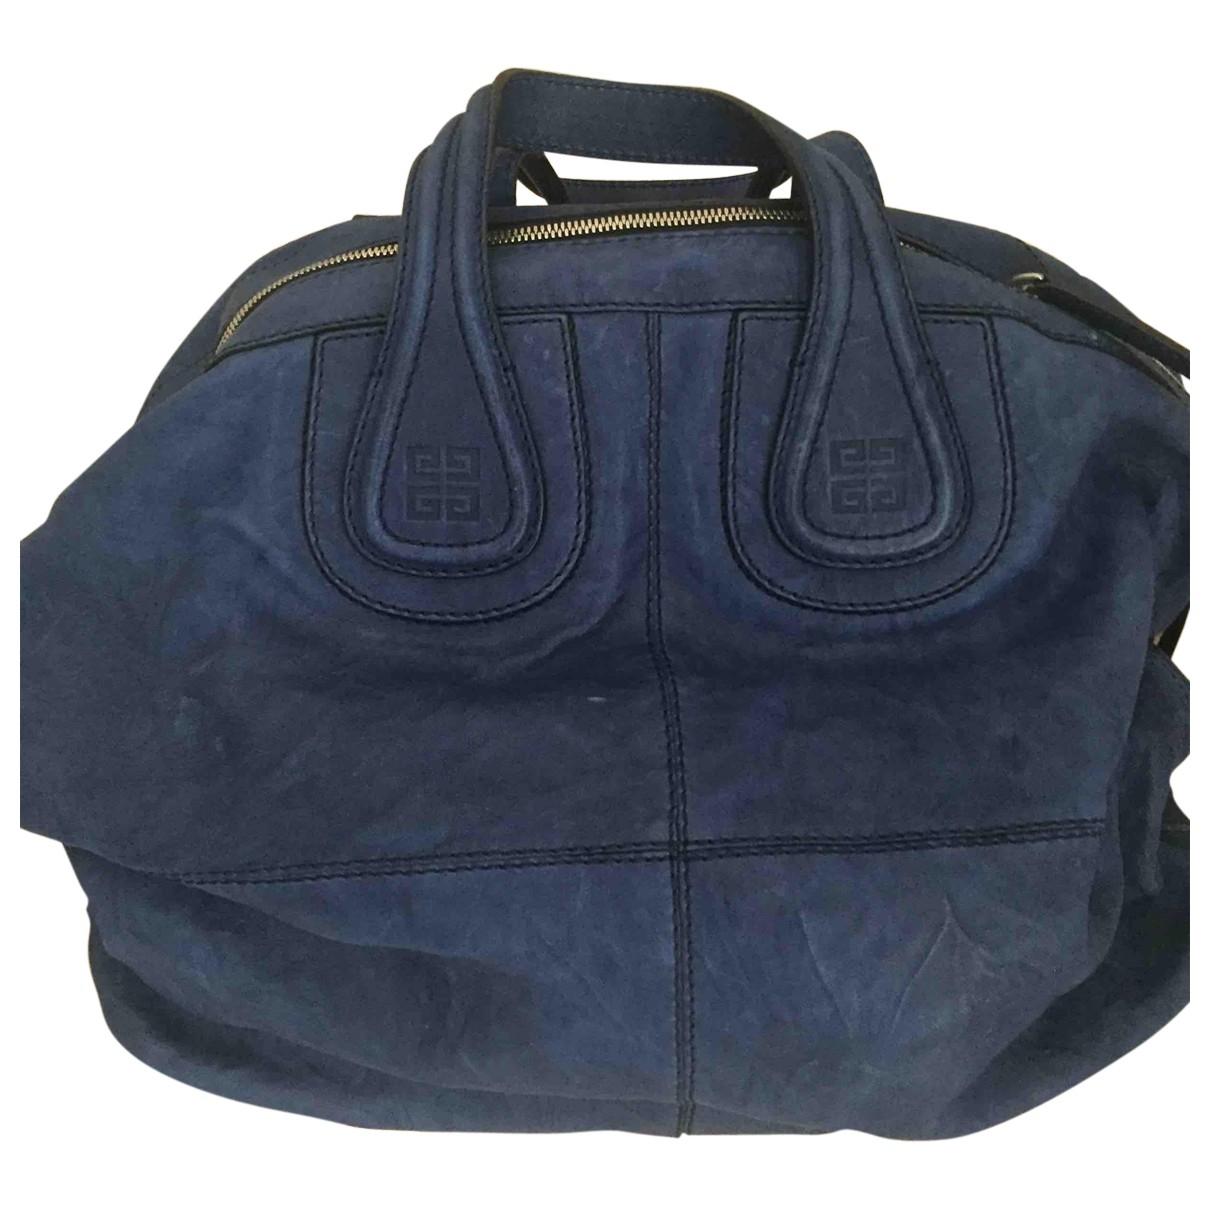 Givenchy \N Leather handbag for Women \N